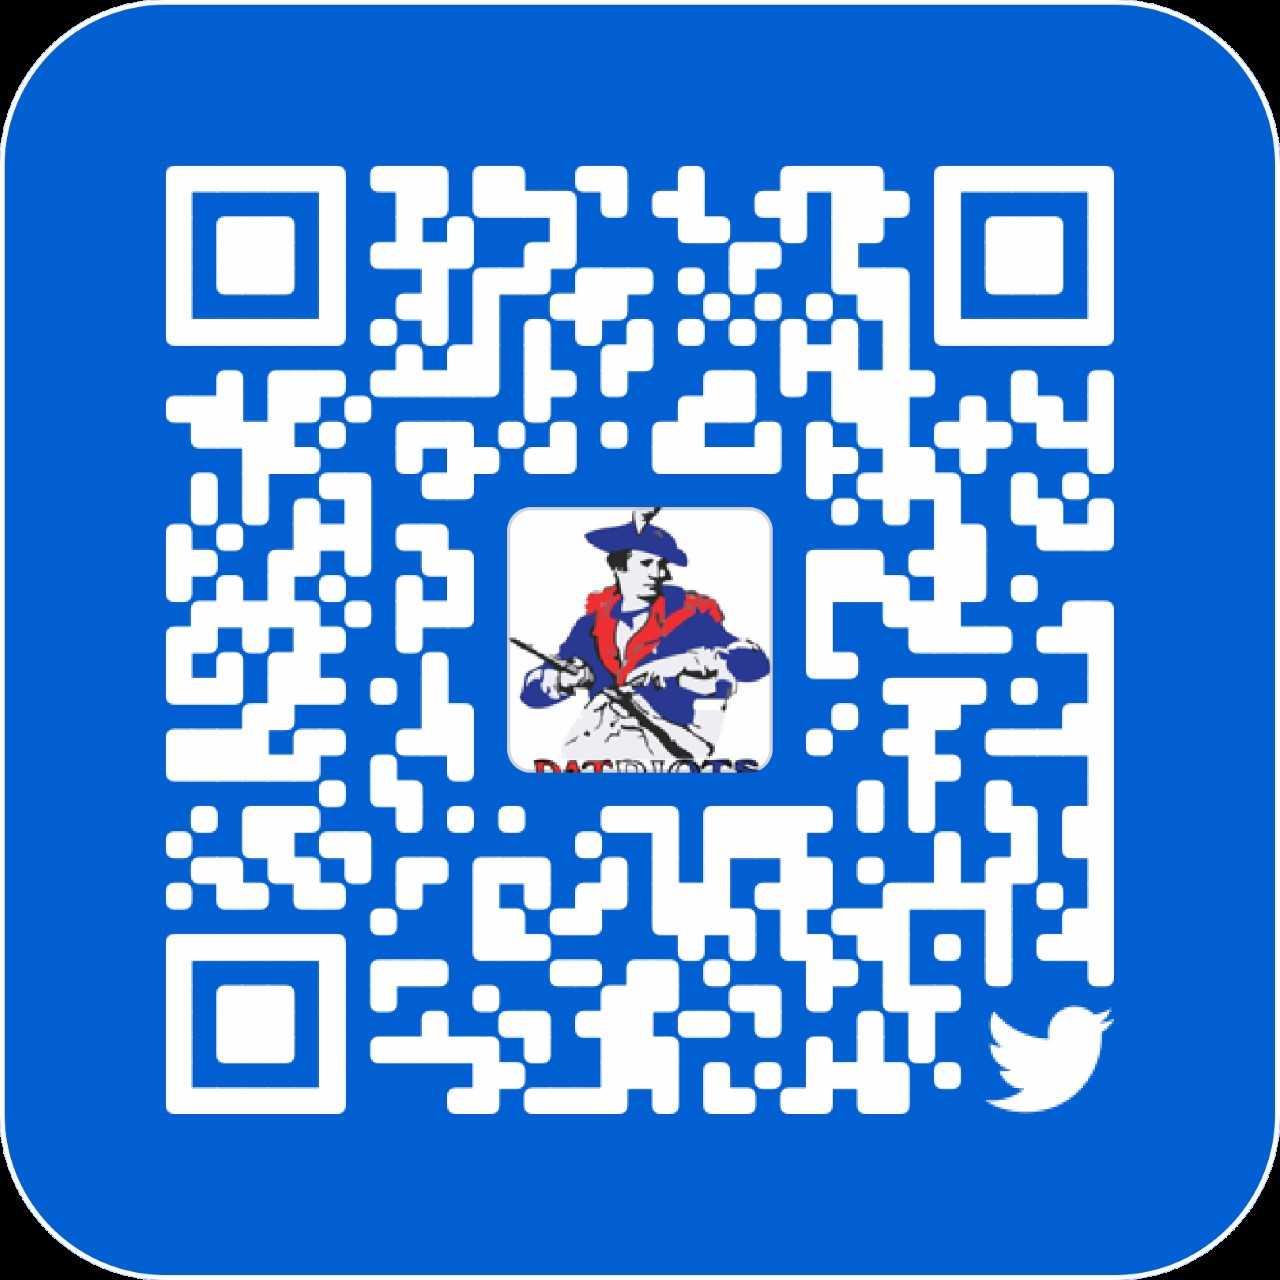 Class of 2021 QR Code Image